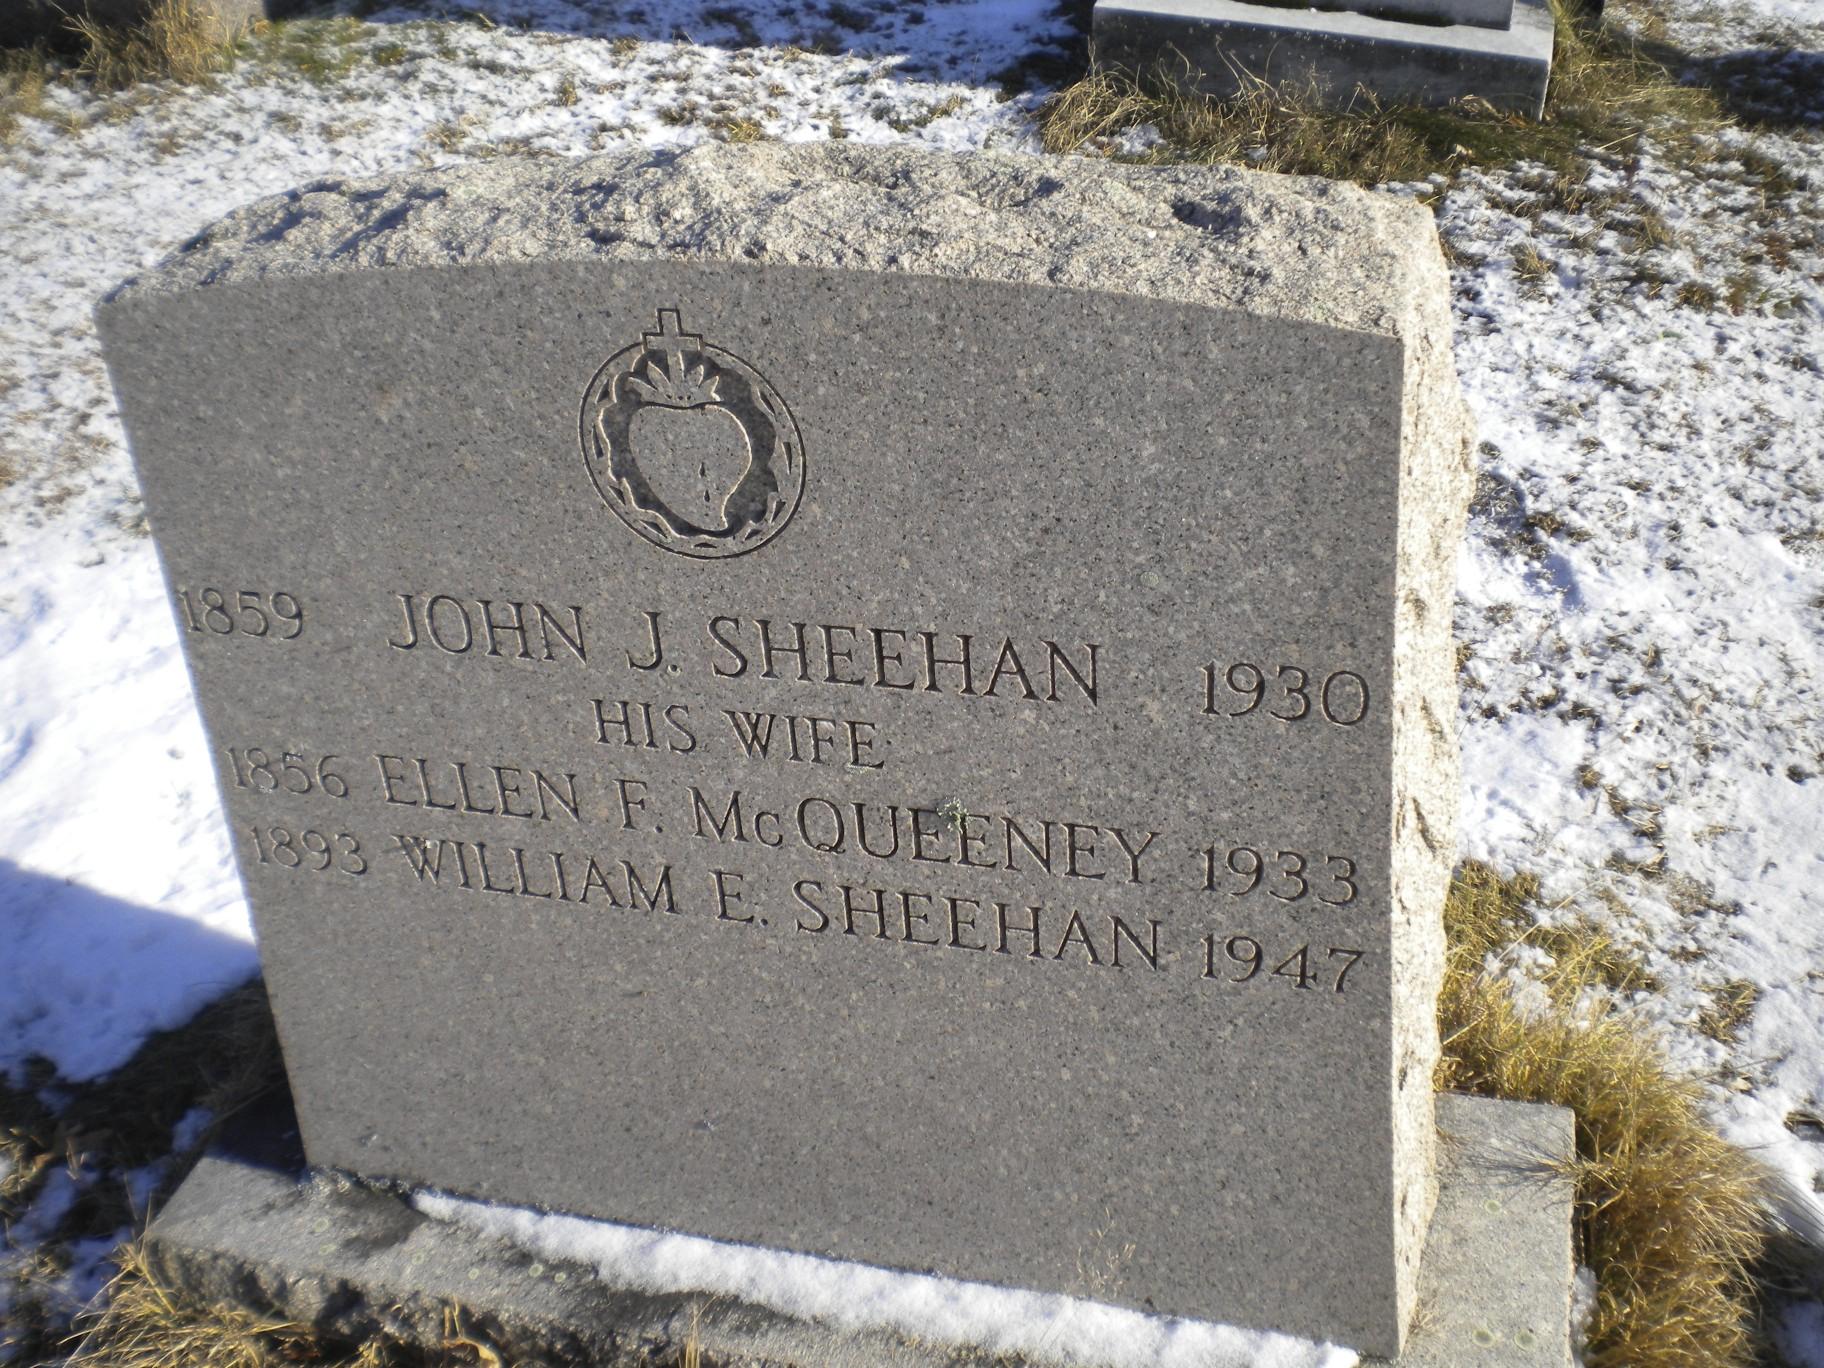 Sheehan Gravestone at St. Charles Cemetery in Blackstone, MA